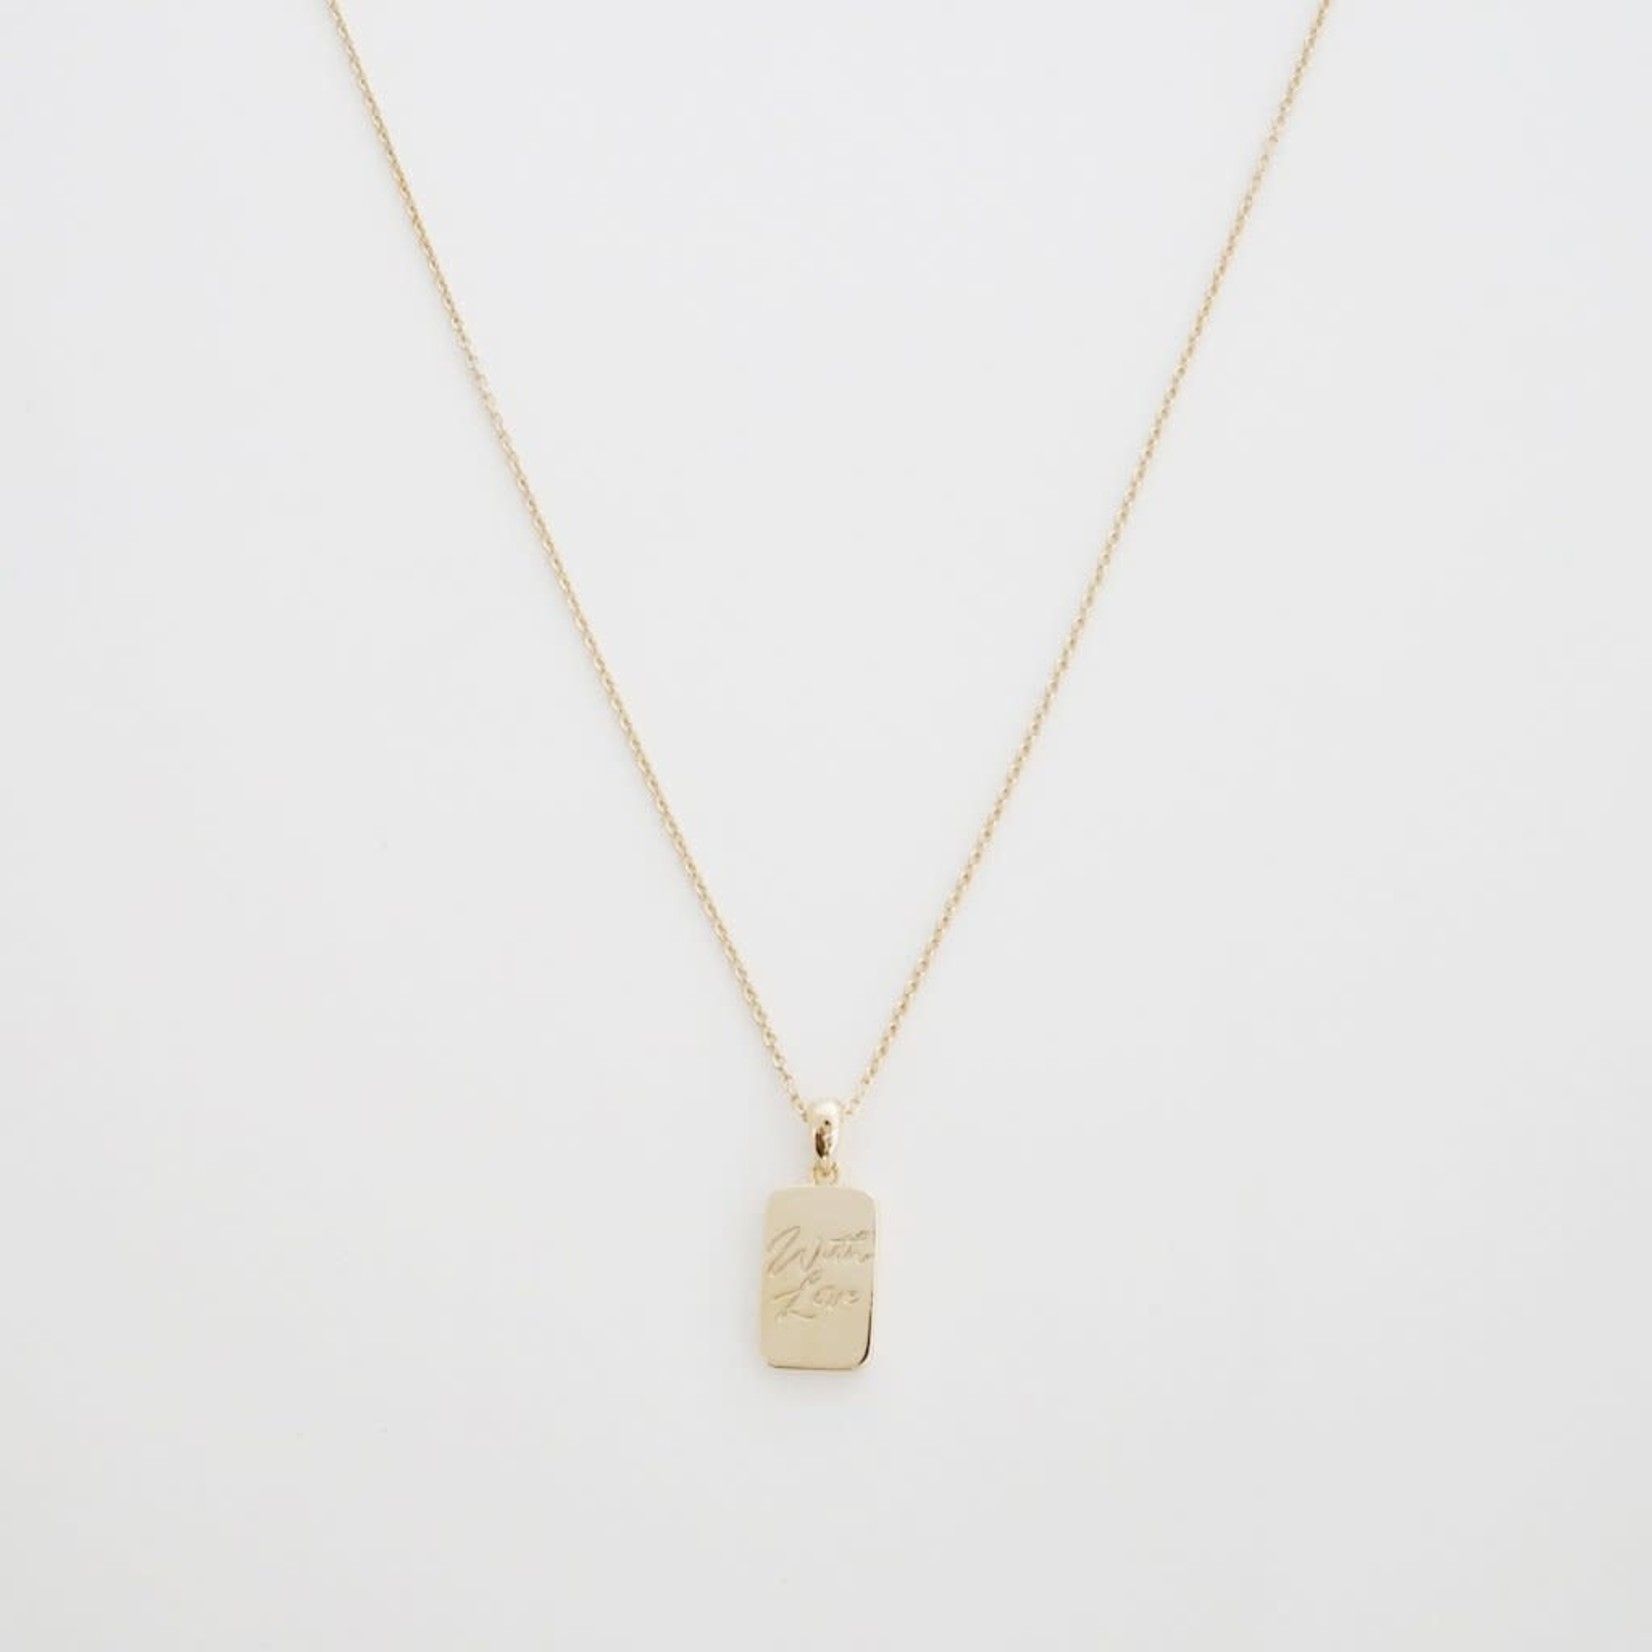 Honeycat Jewelry Honeycat Moonlight Pendant Necklace